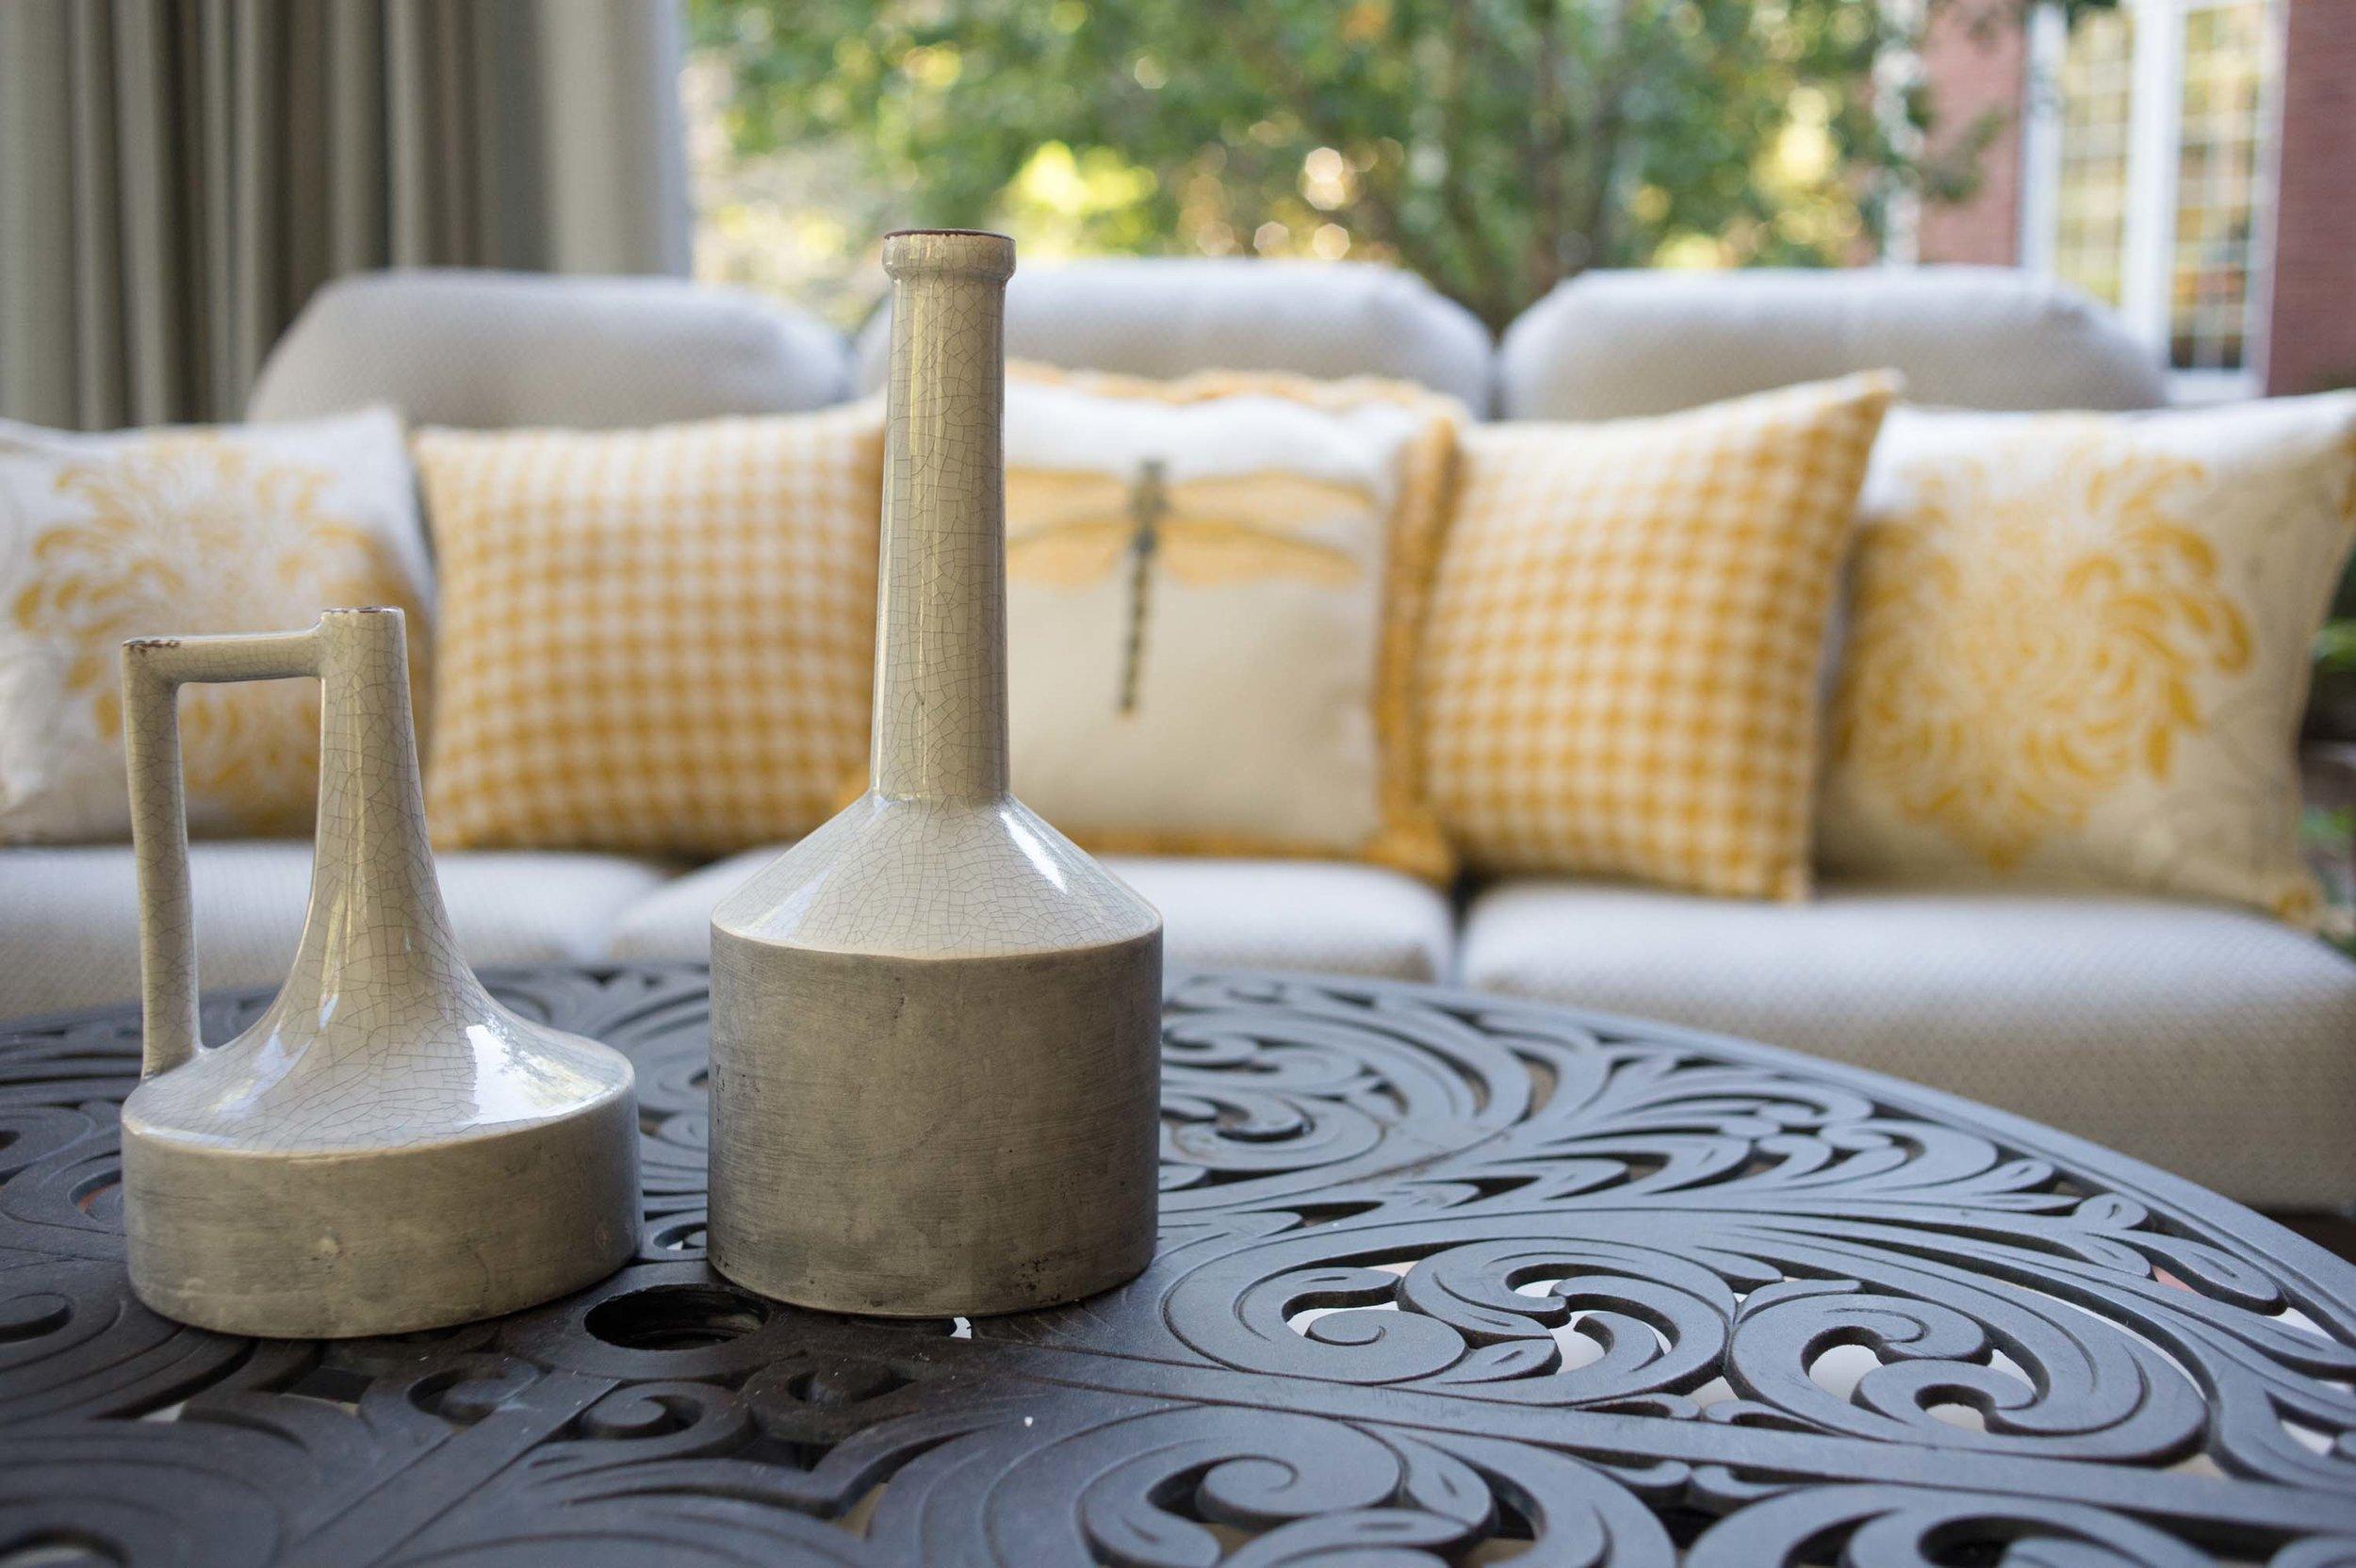 Ceramic bottle on a modern style center table